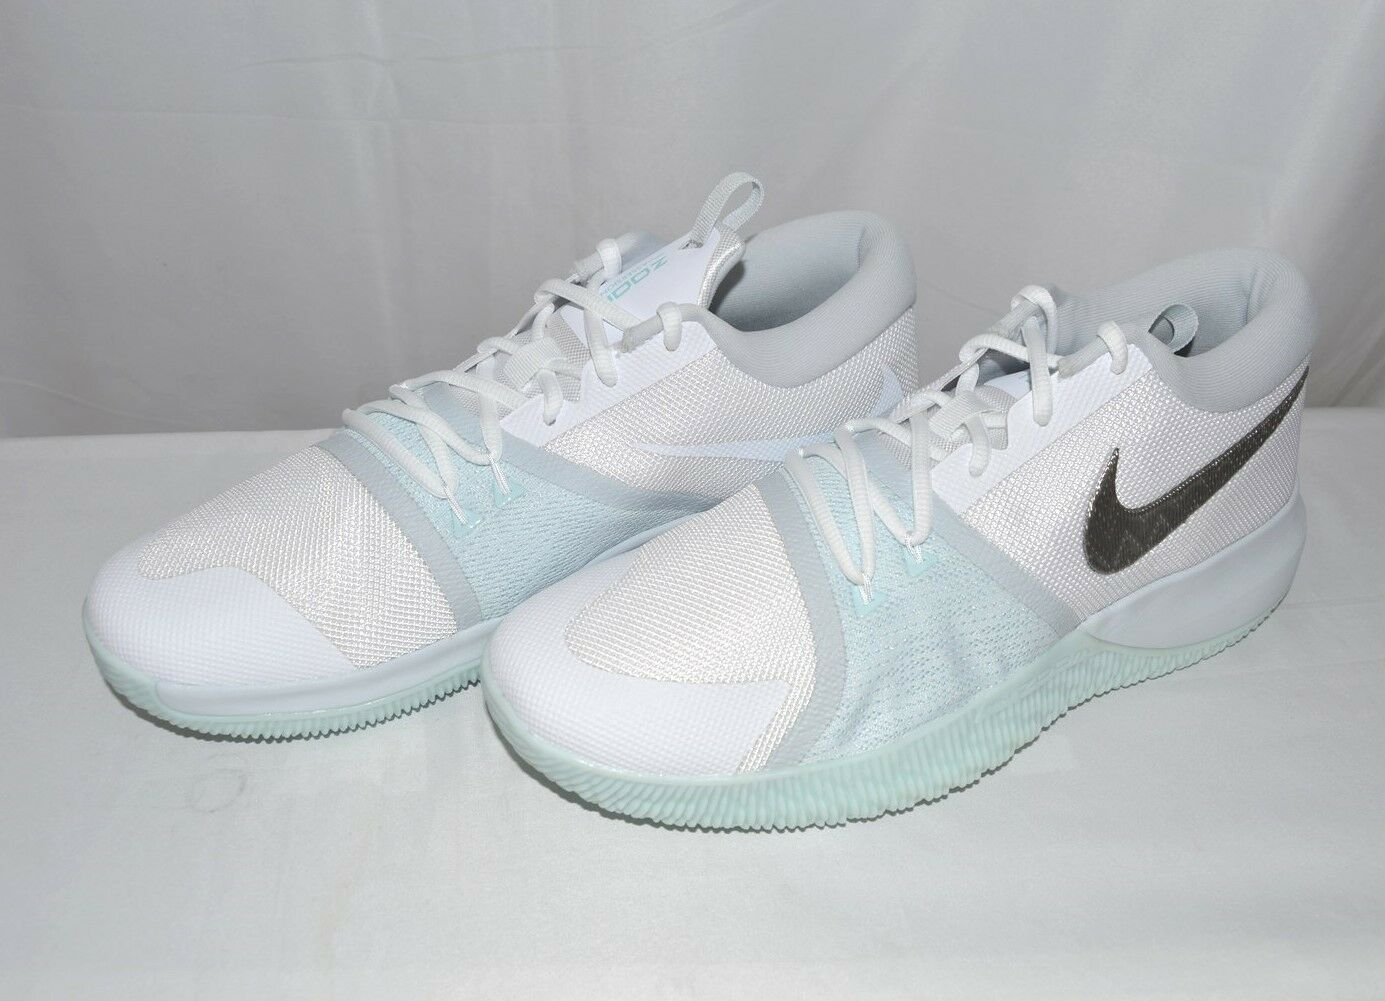 Nike Men's Zoom Assersion Basketball Shoes 917505 104 White/Glacier,